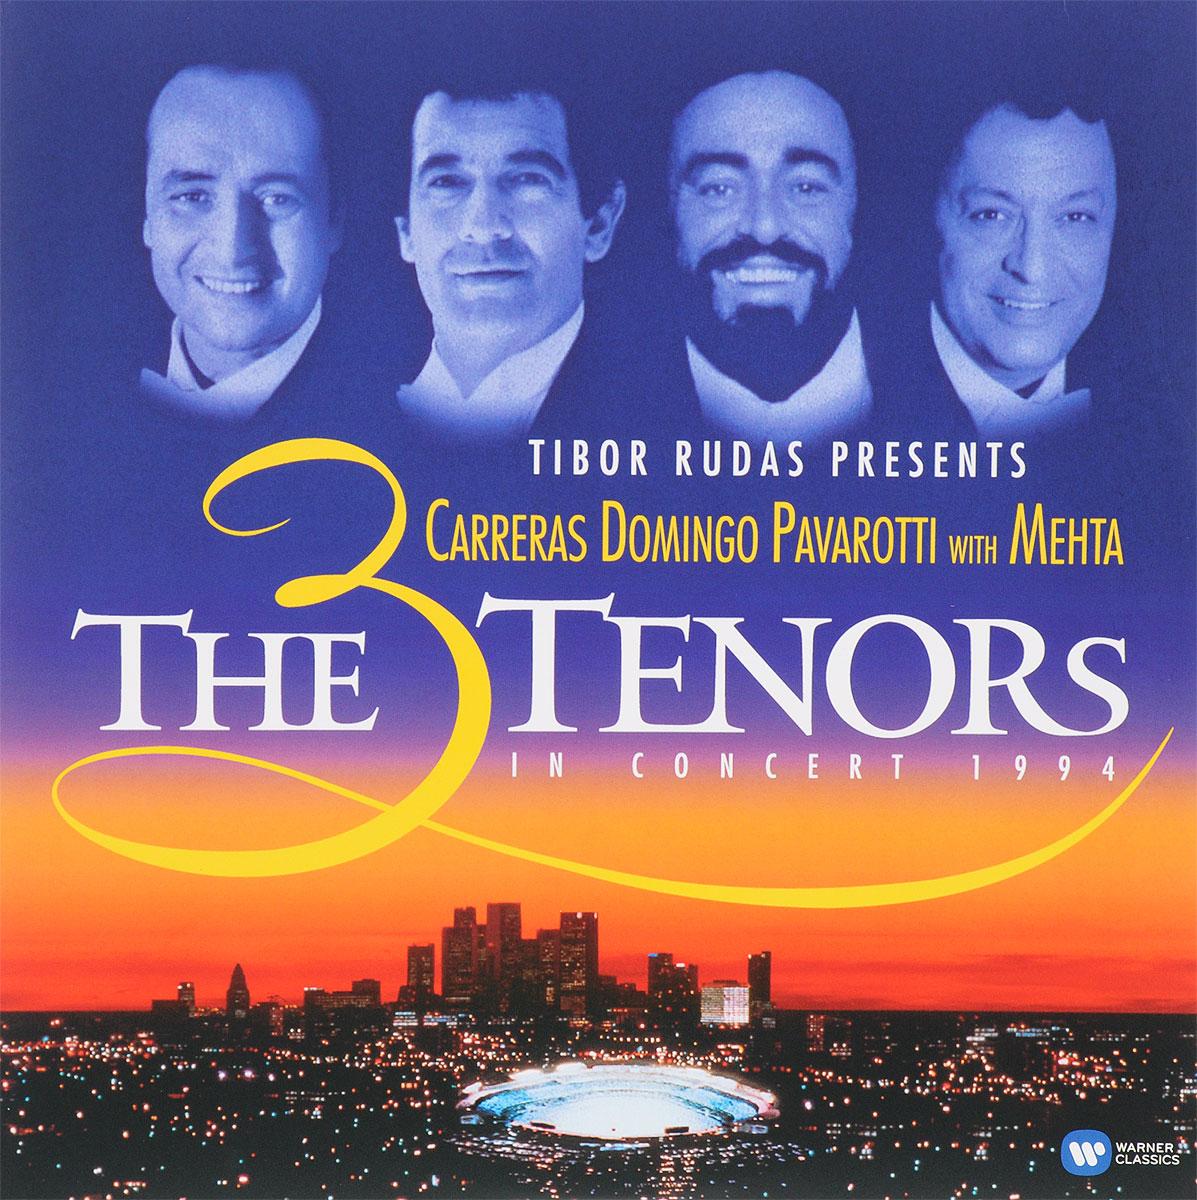 The 3 Tenors,Хосе Каррерас,Пласидо Доминго,Лучано Паваротти,Зубин Мета,The Los Angeles Philharmonic,Los Angeles Music Center Opera Chorus The 3 Tenors. The 3 Tenors In Concert 1994 (2 LP) цена